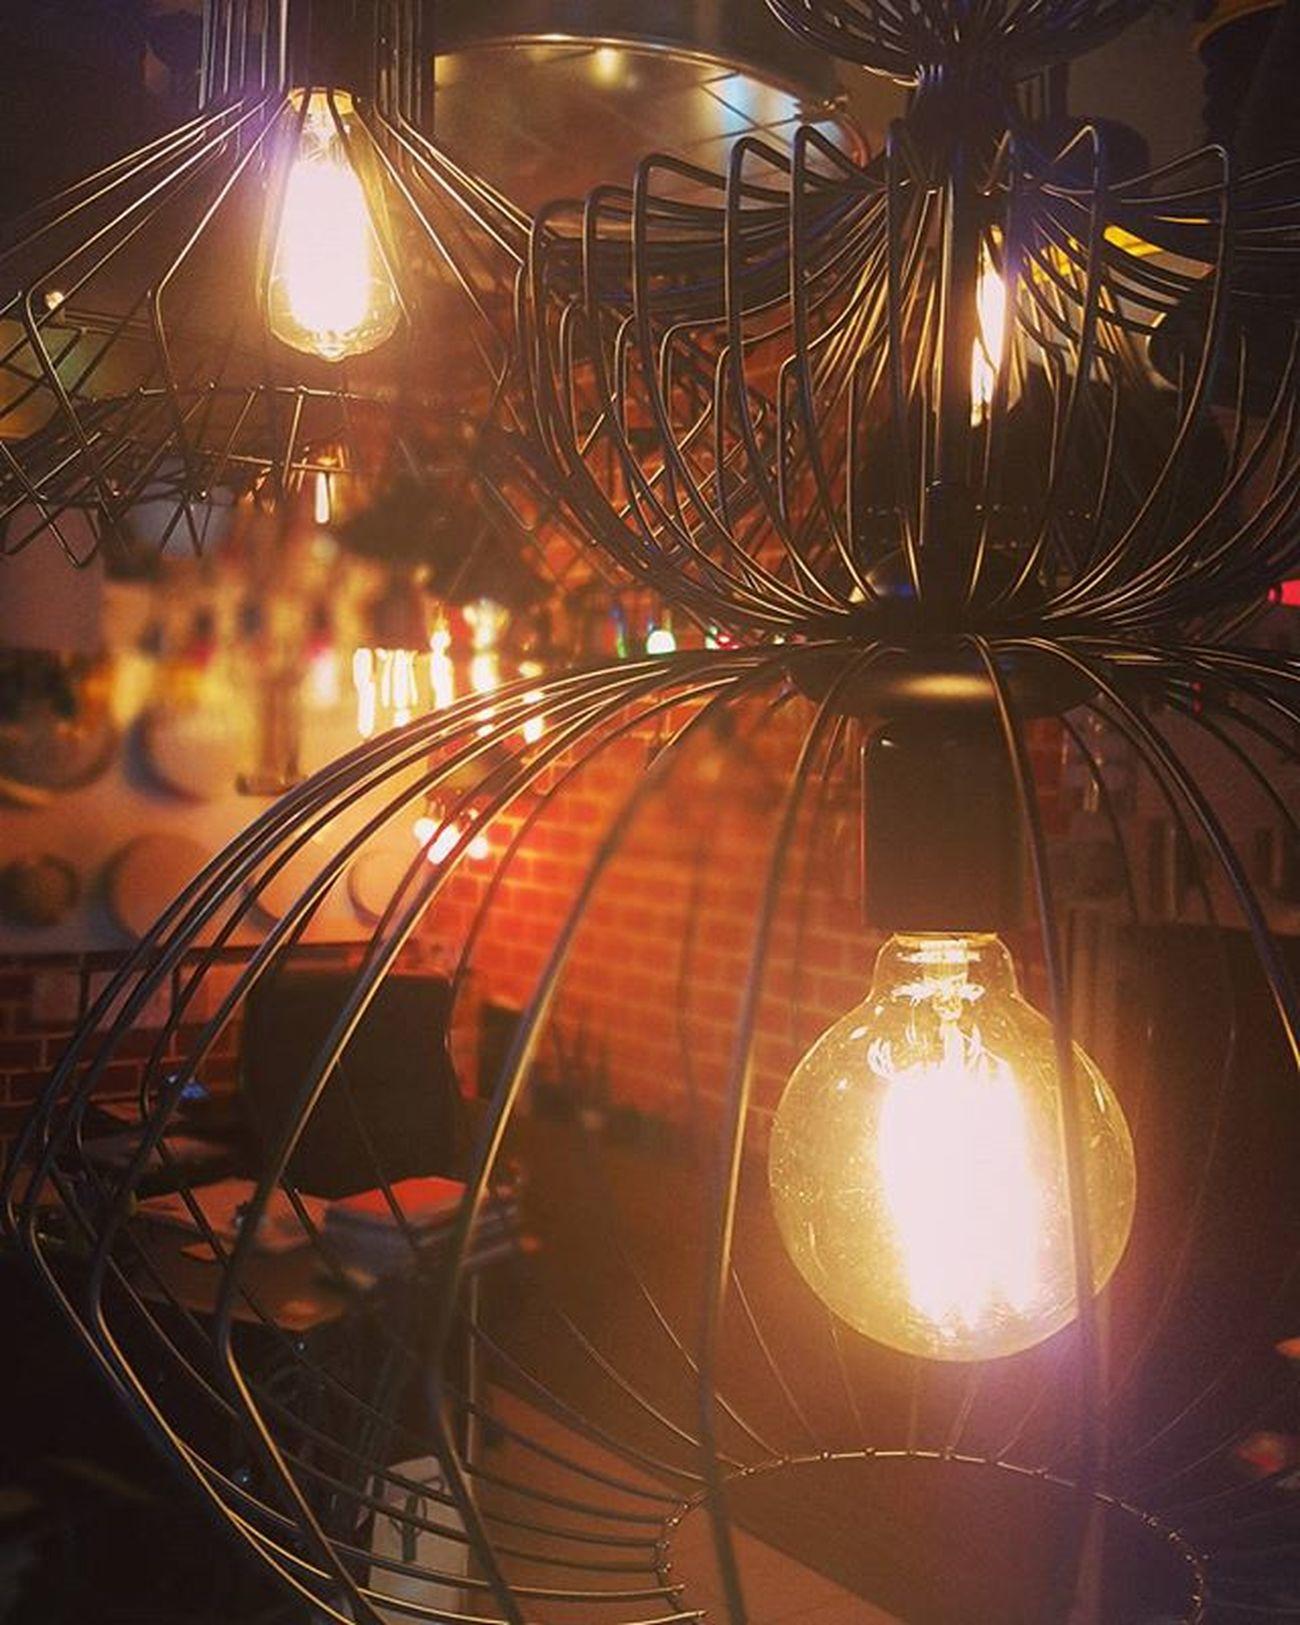 Light Aydınlatma Vintage Erdenfener Tel Rustik Ampul Edison Imalat Toptan Perakende HDR Vs Vscocam Inst Instagood Instagramers Visual Visualsoflife Suborusu Avize Karaköy Istanbul